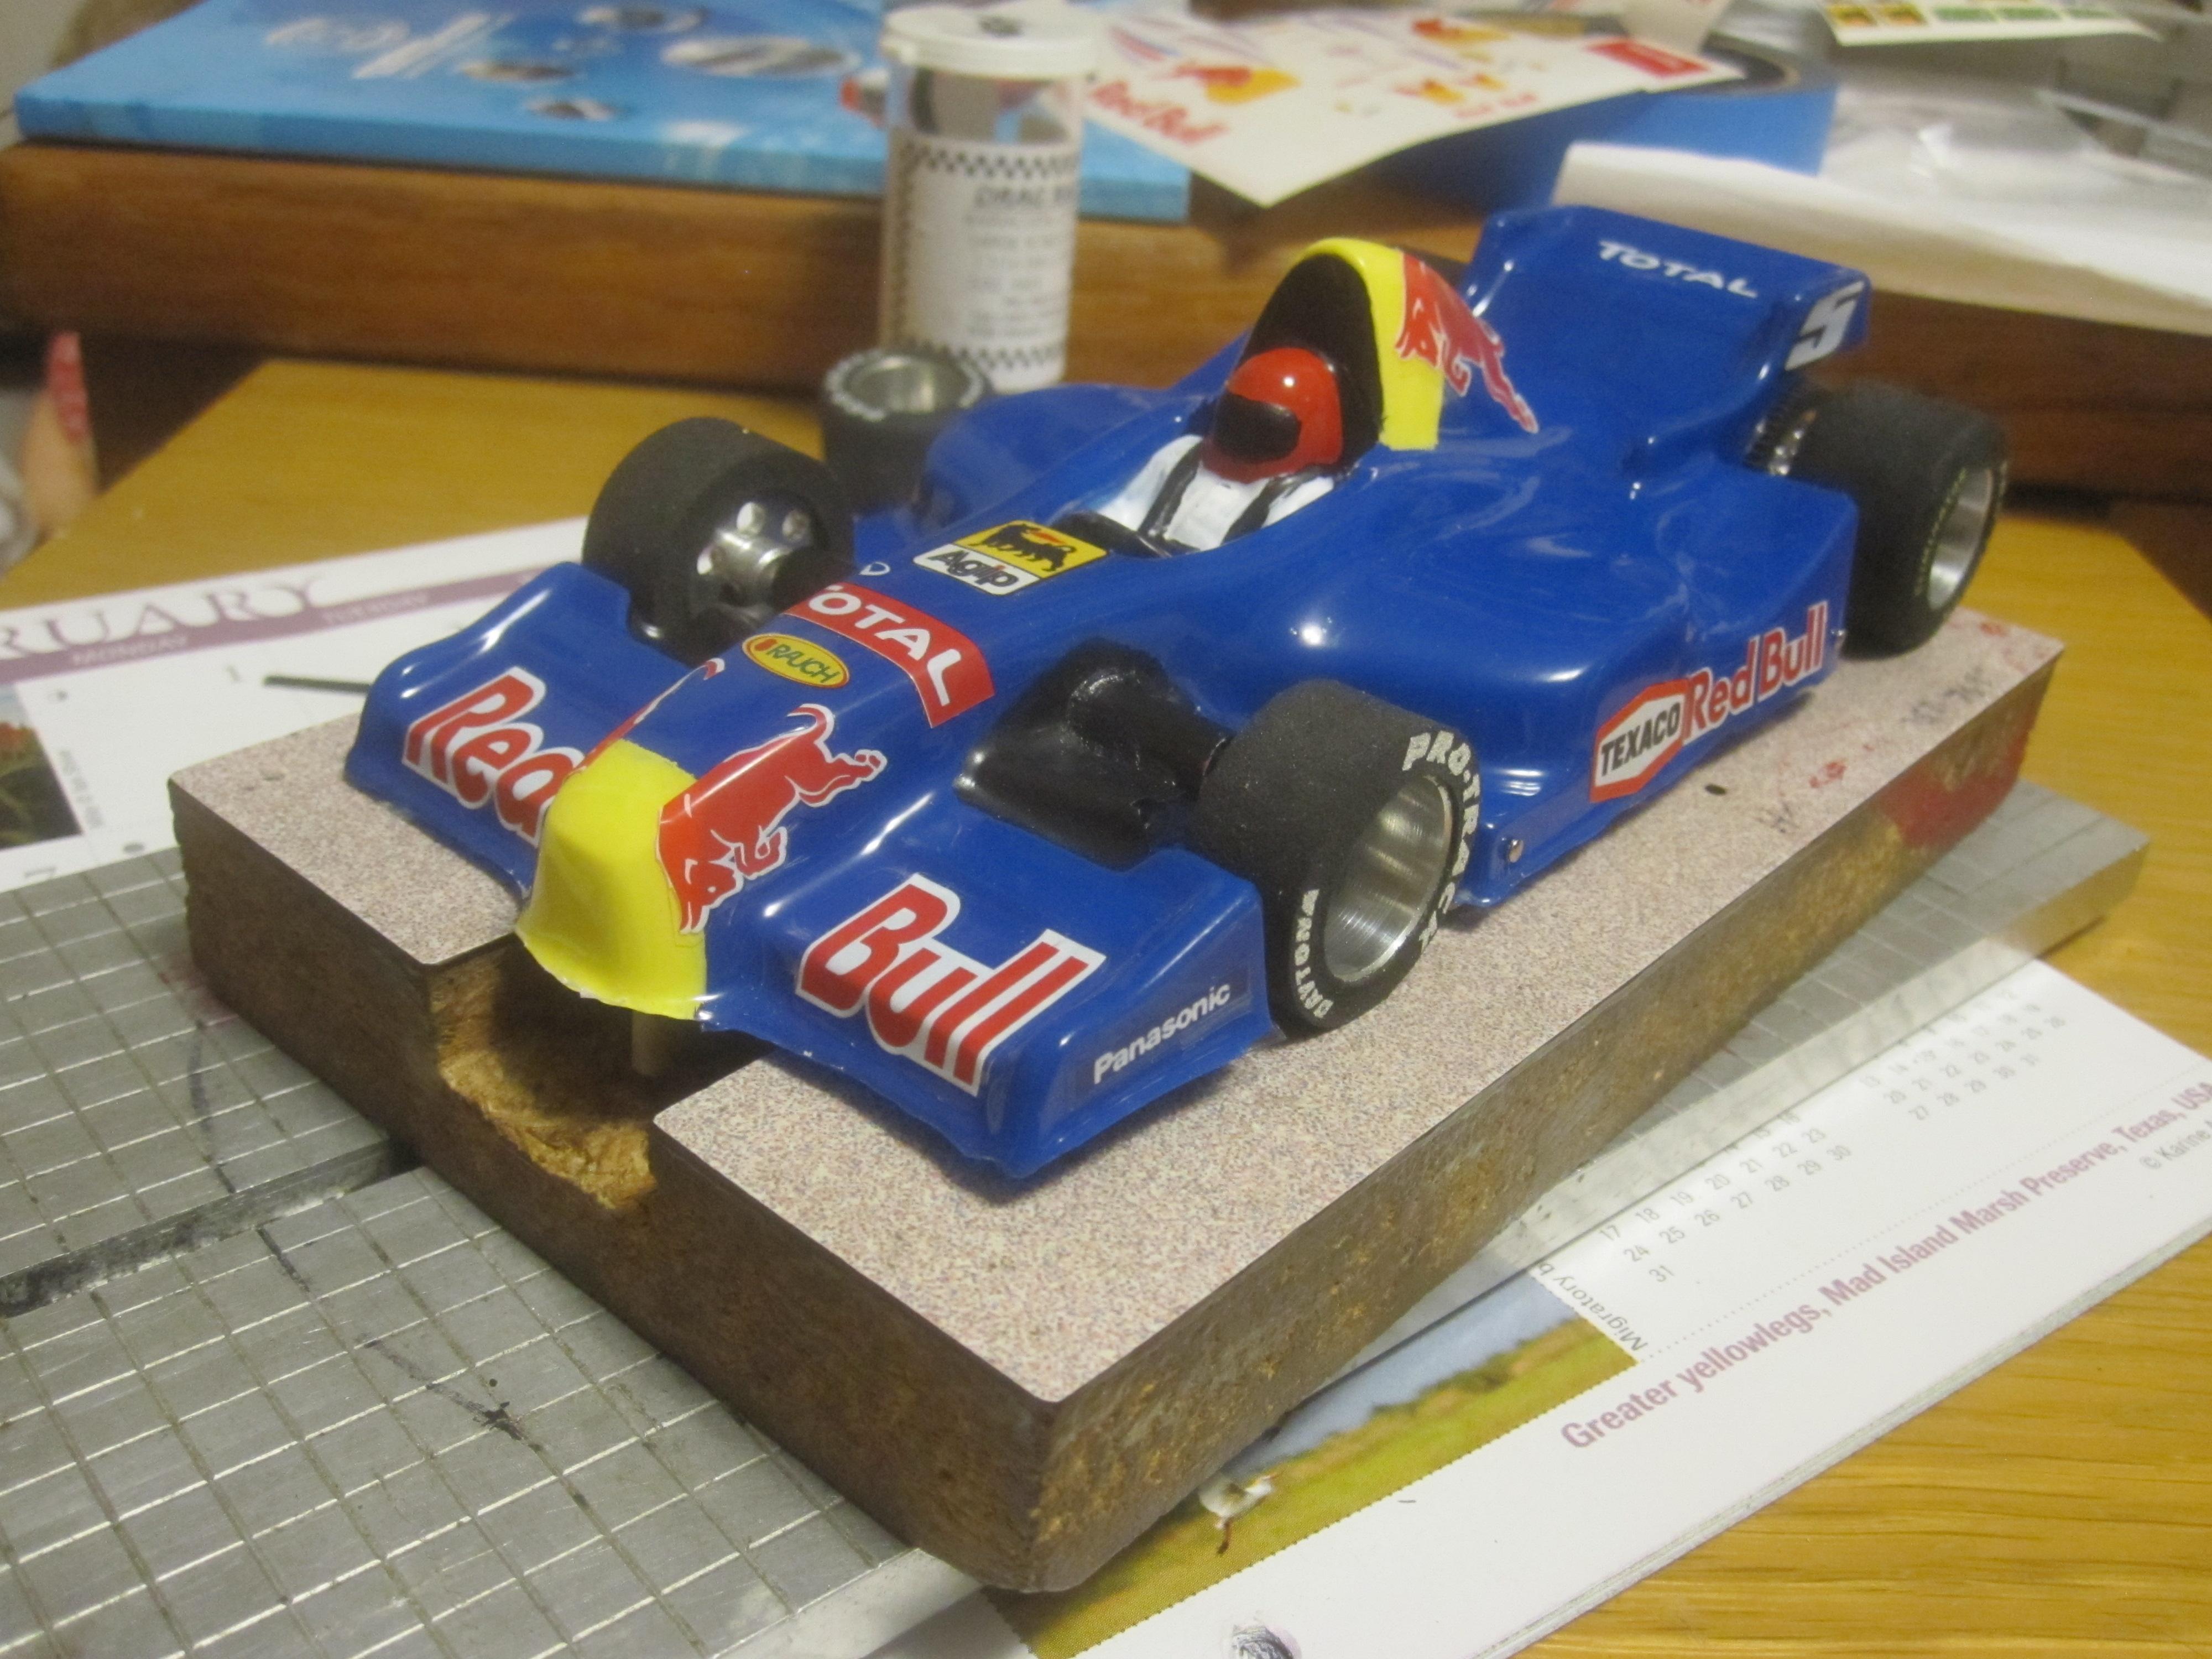 http://www.naste.org/members/bill/RaceResultsICb.jpg